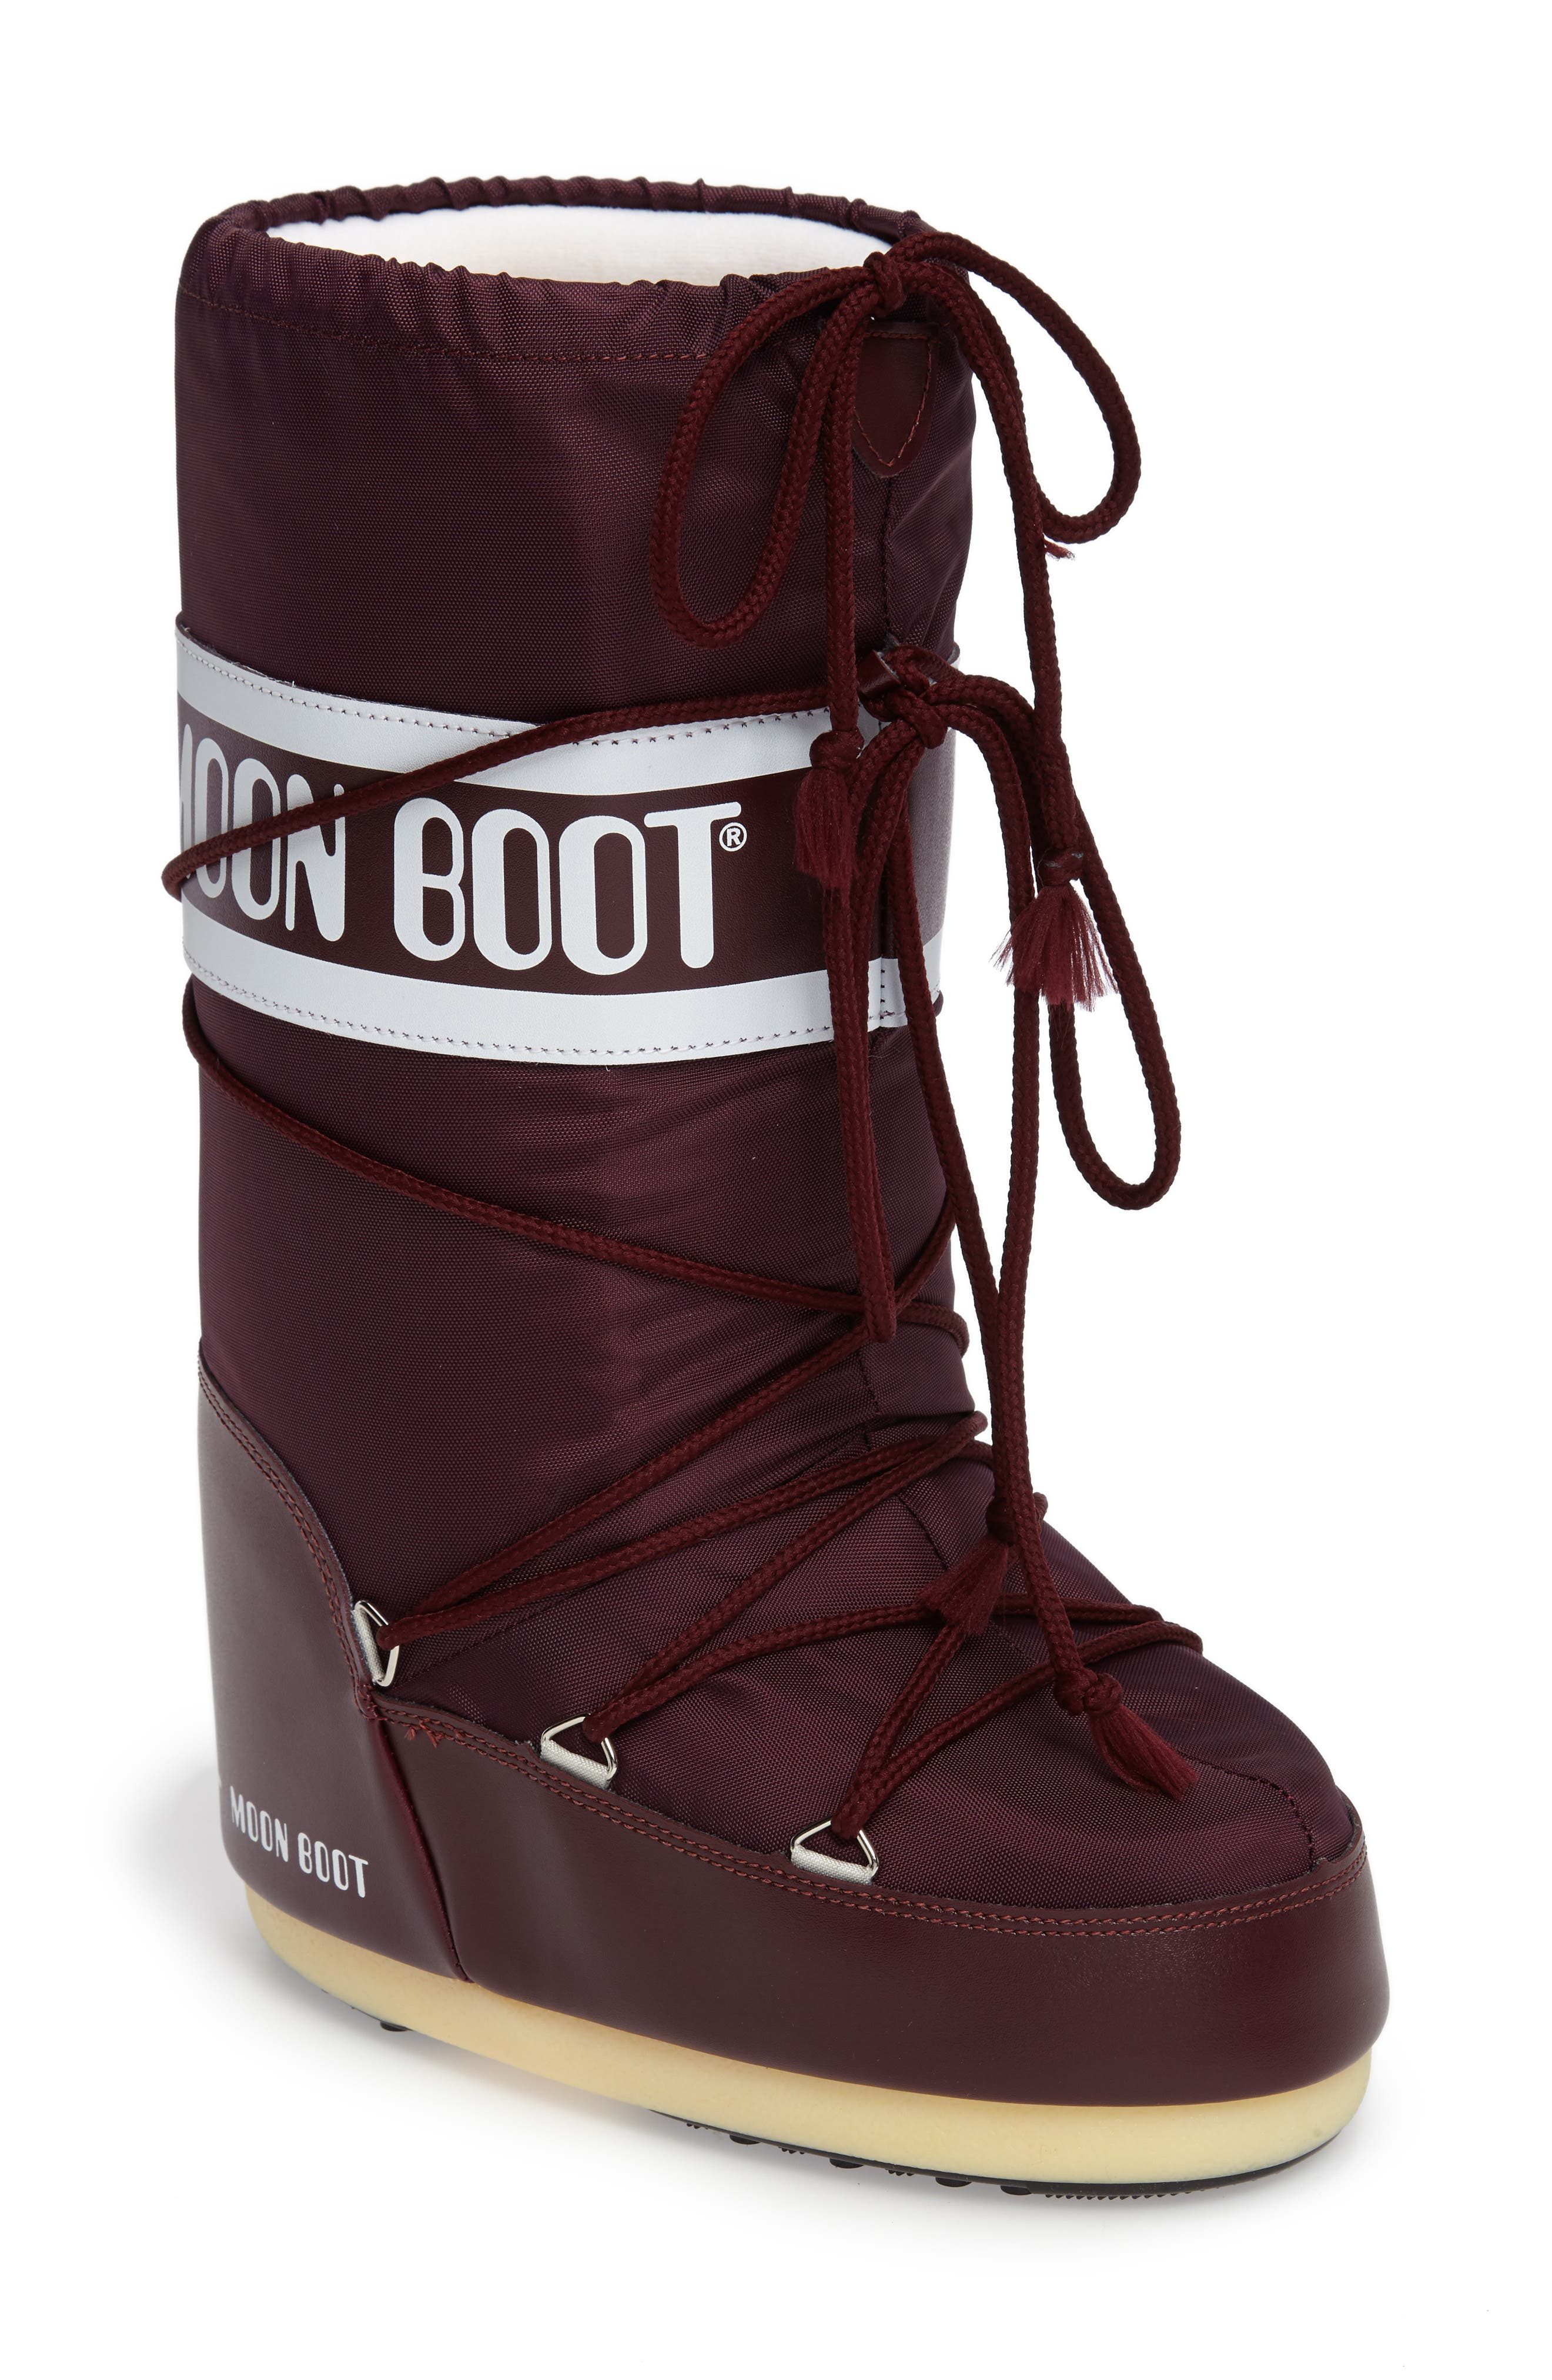 Alternate Image 1 Selected - Tecnica® 'Original' Moon Boot®